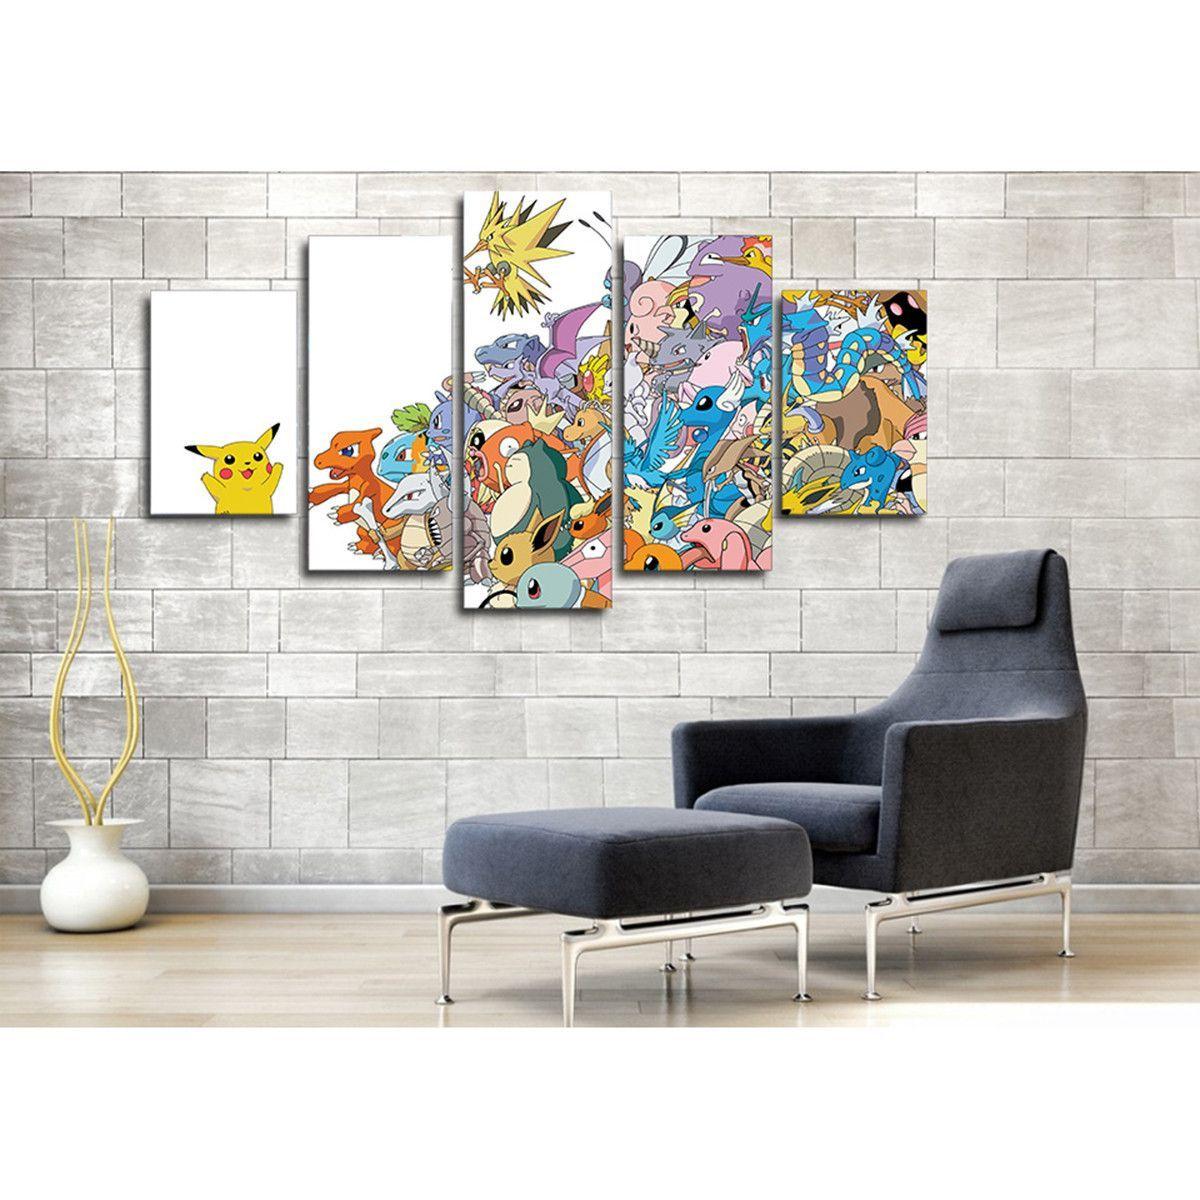 Pokemon pcs large canvas print art painting picture home decor wall